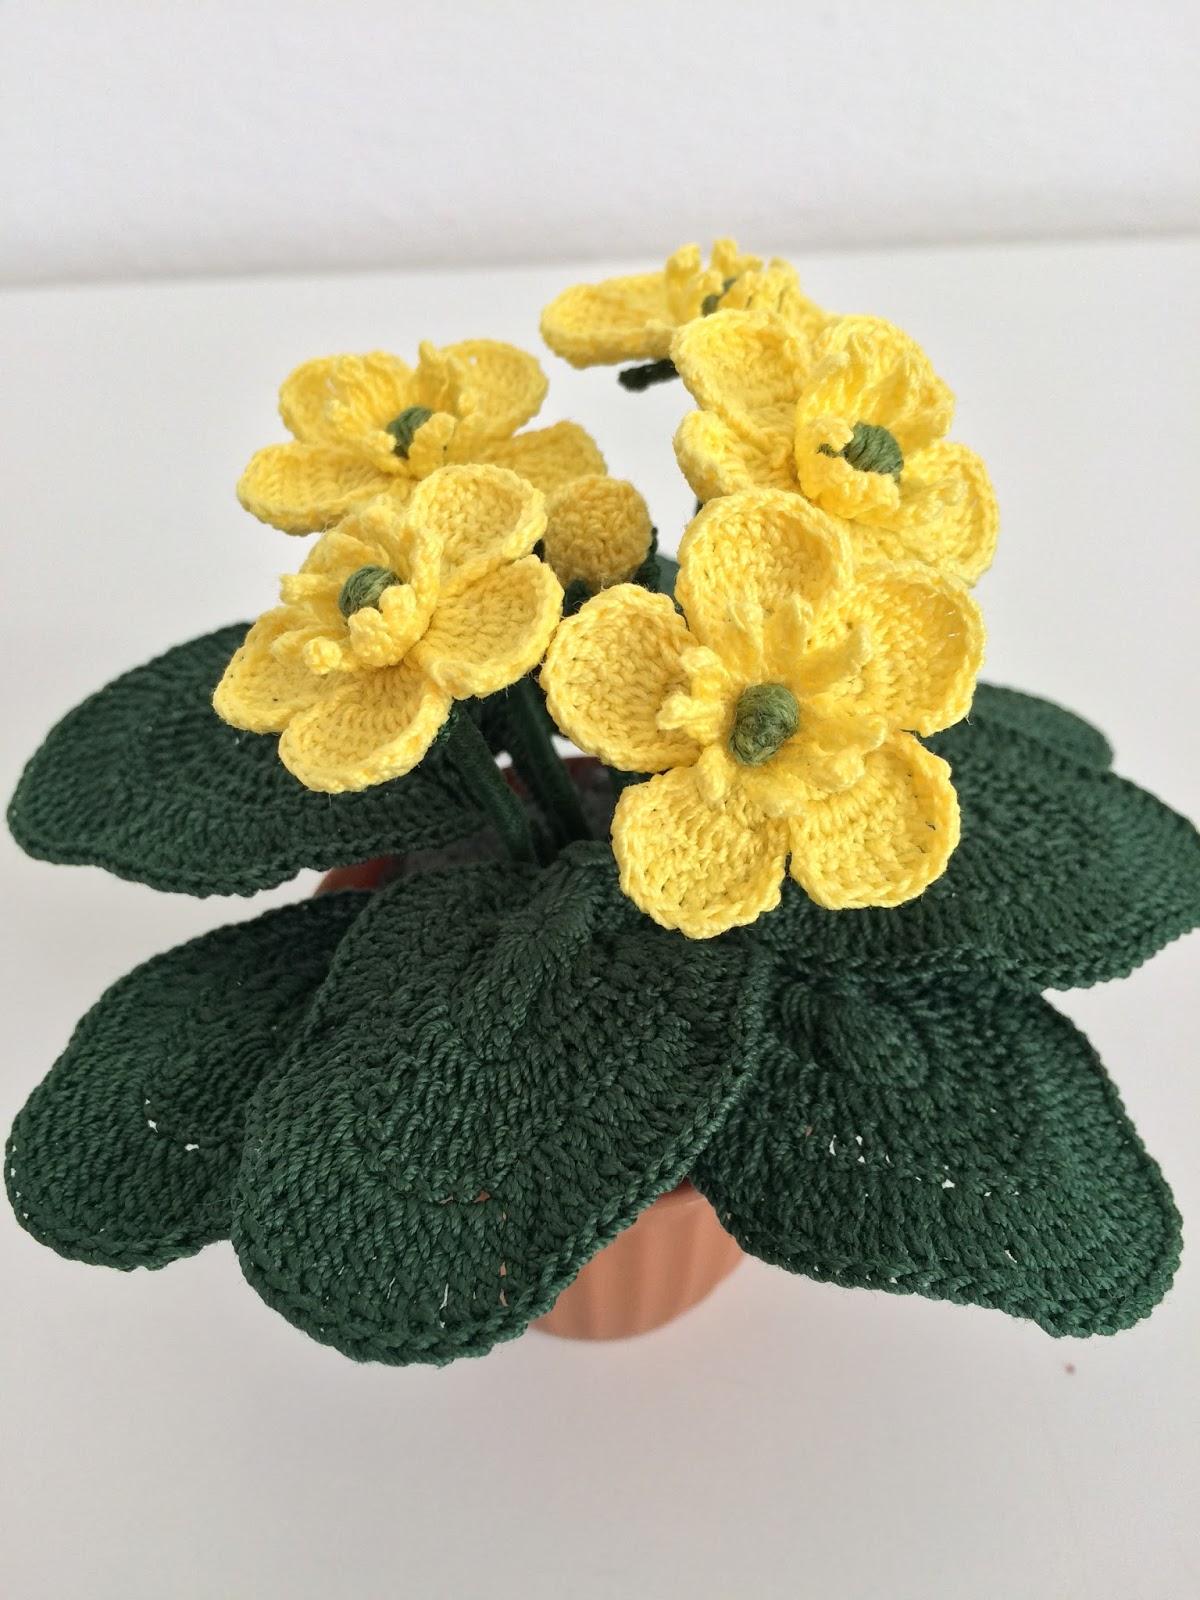 Crochet Butter Cup Flowers Gardening Flower And Vegetables